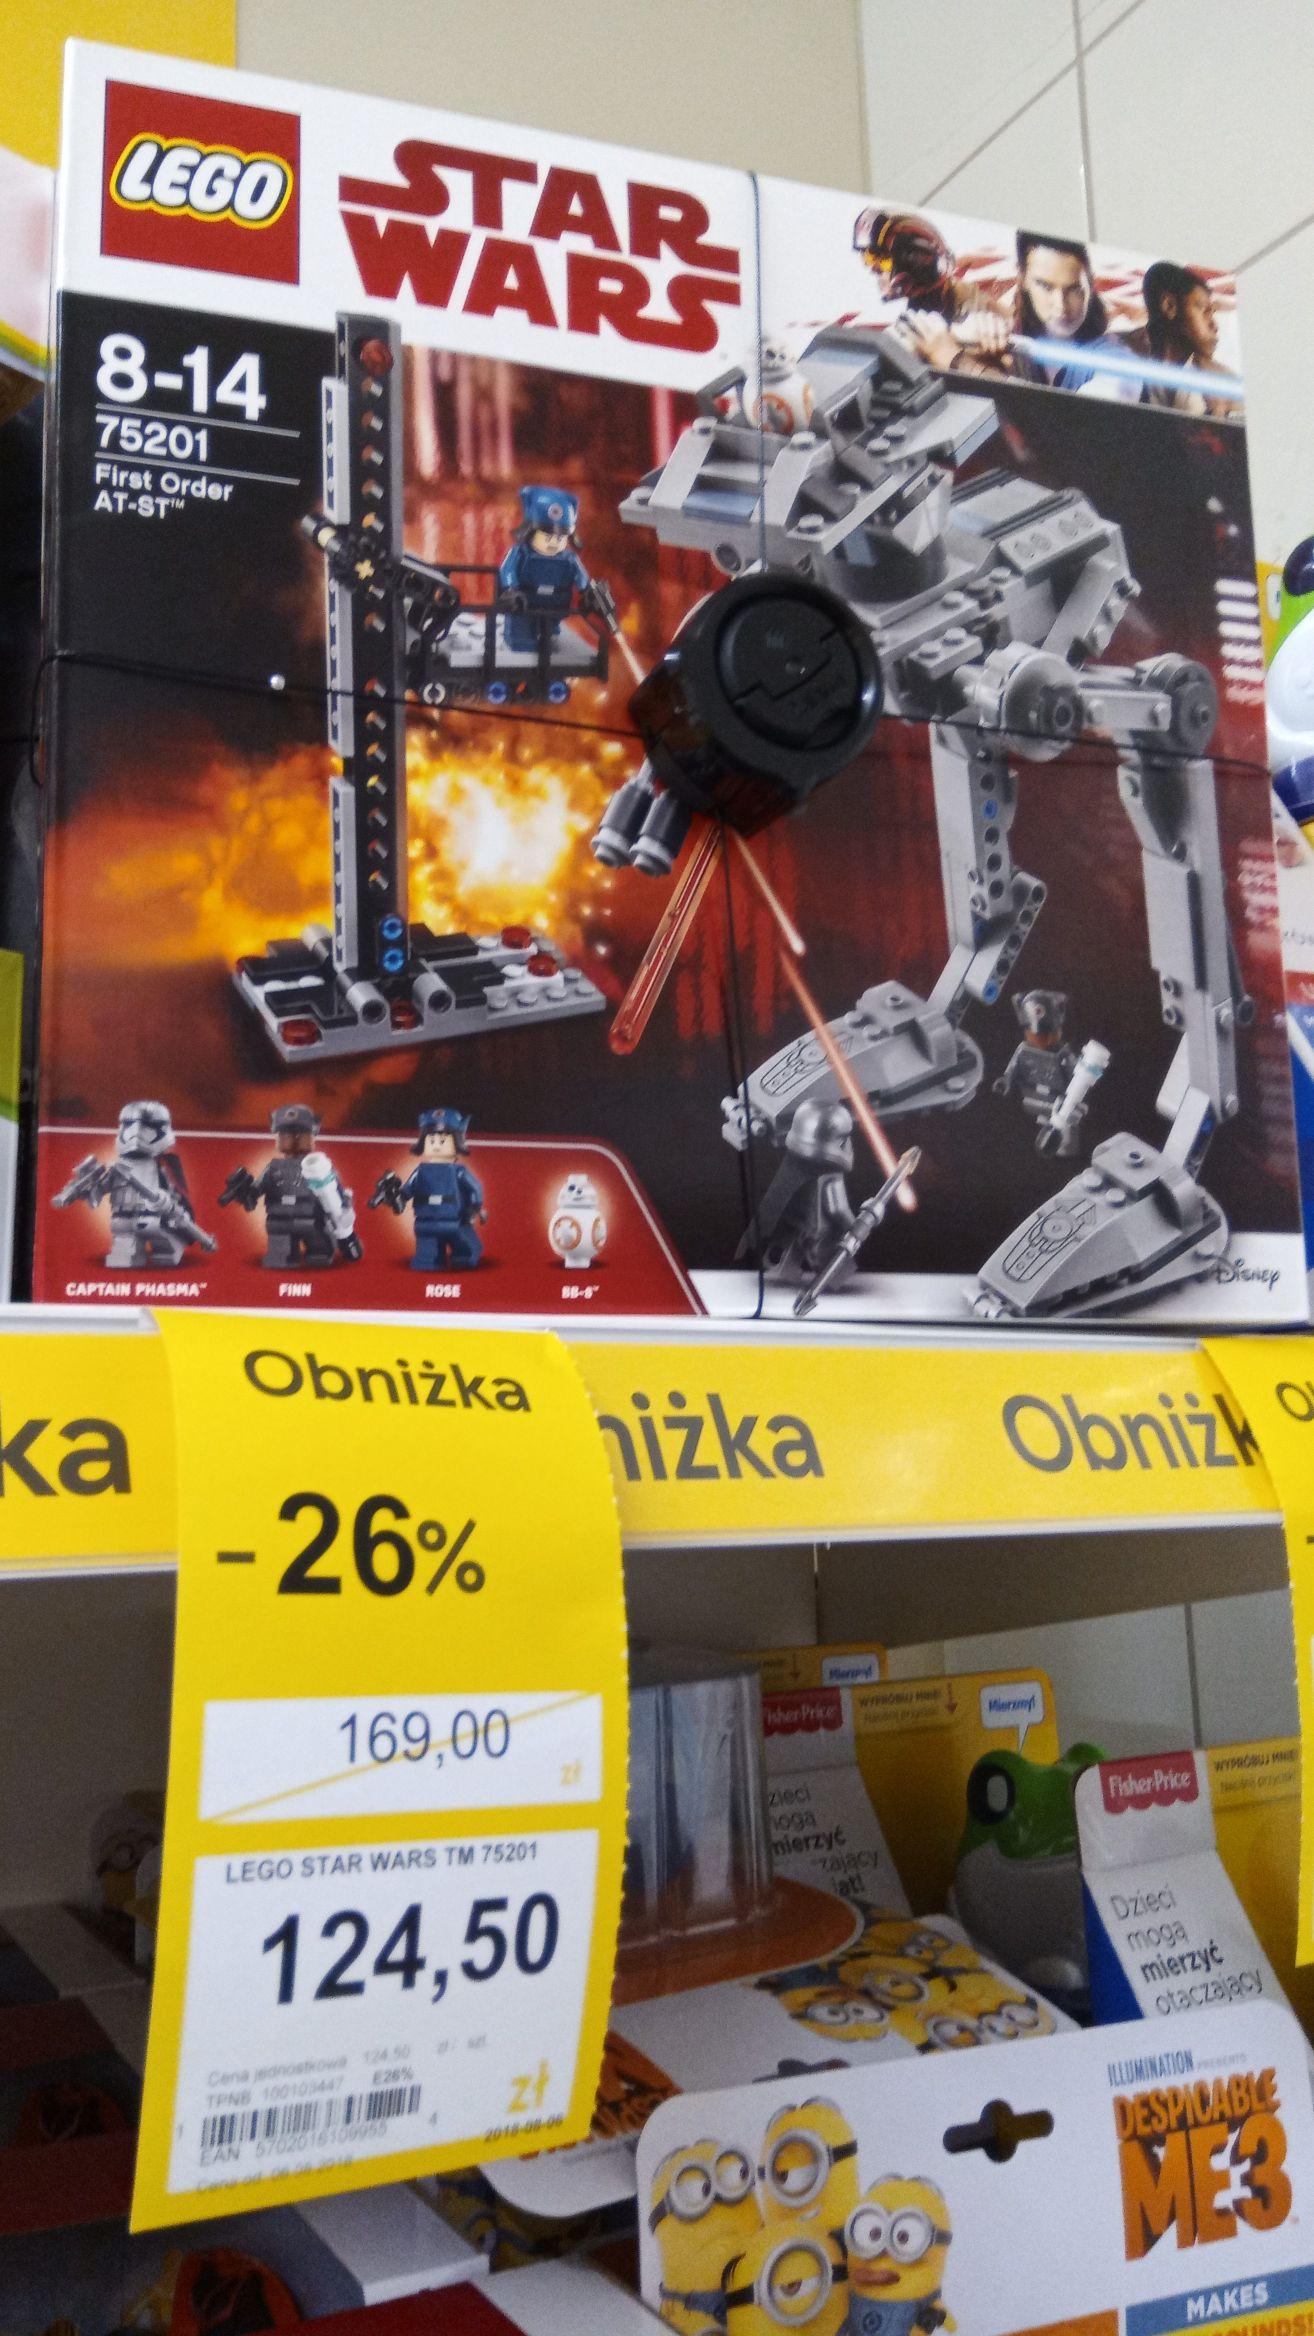 LEGO Star Wars AT-ST 75201 Tesco ŁÓDŹ